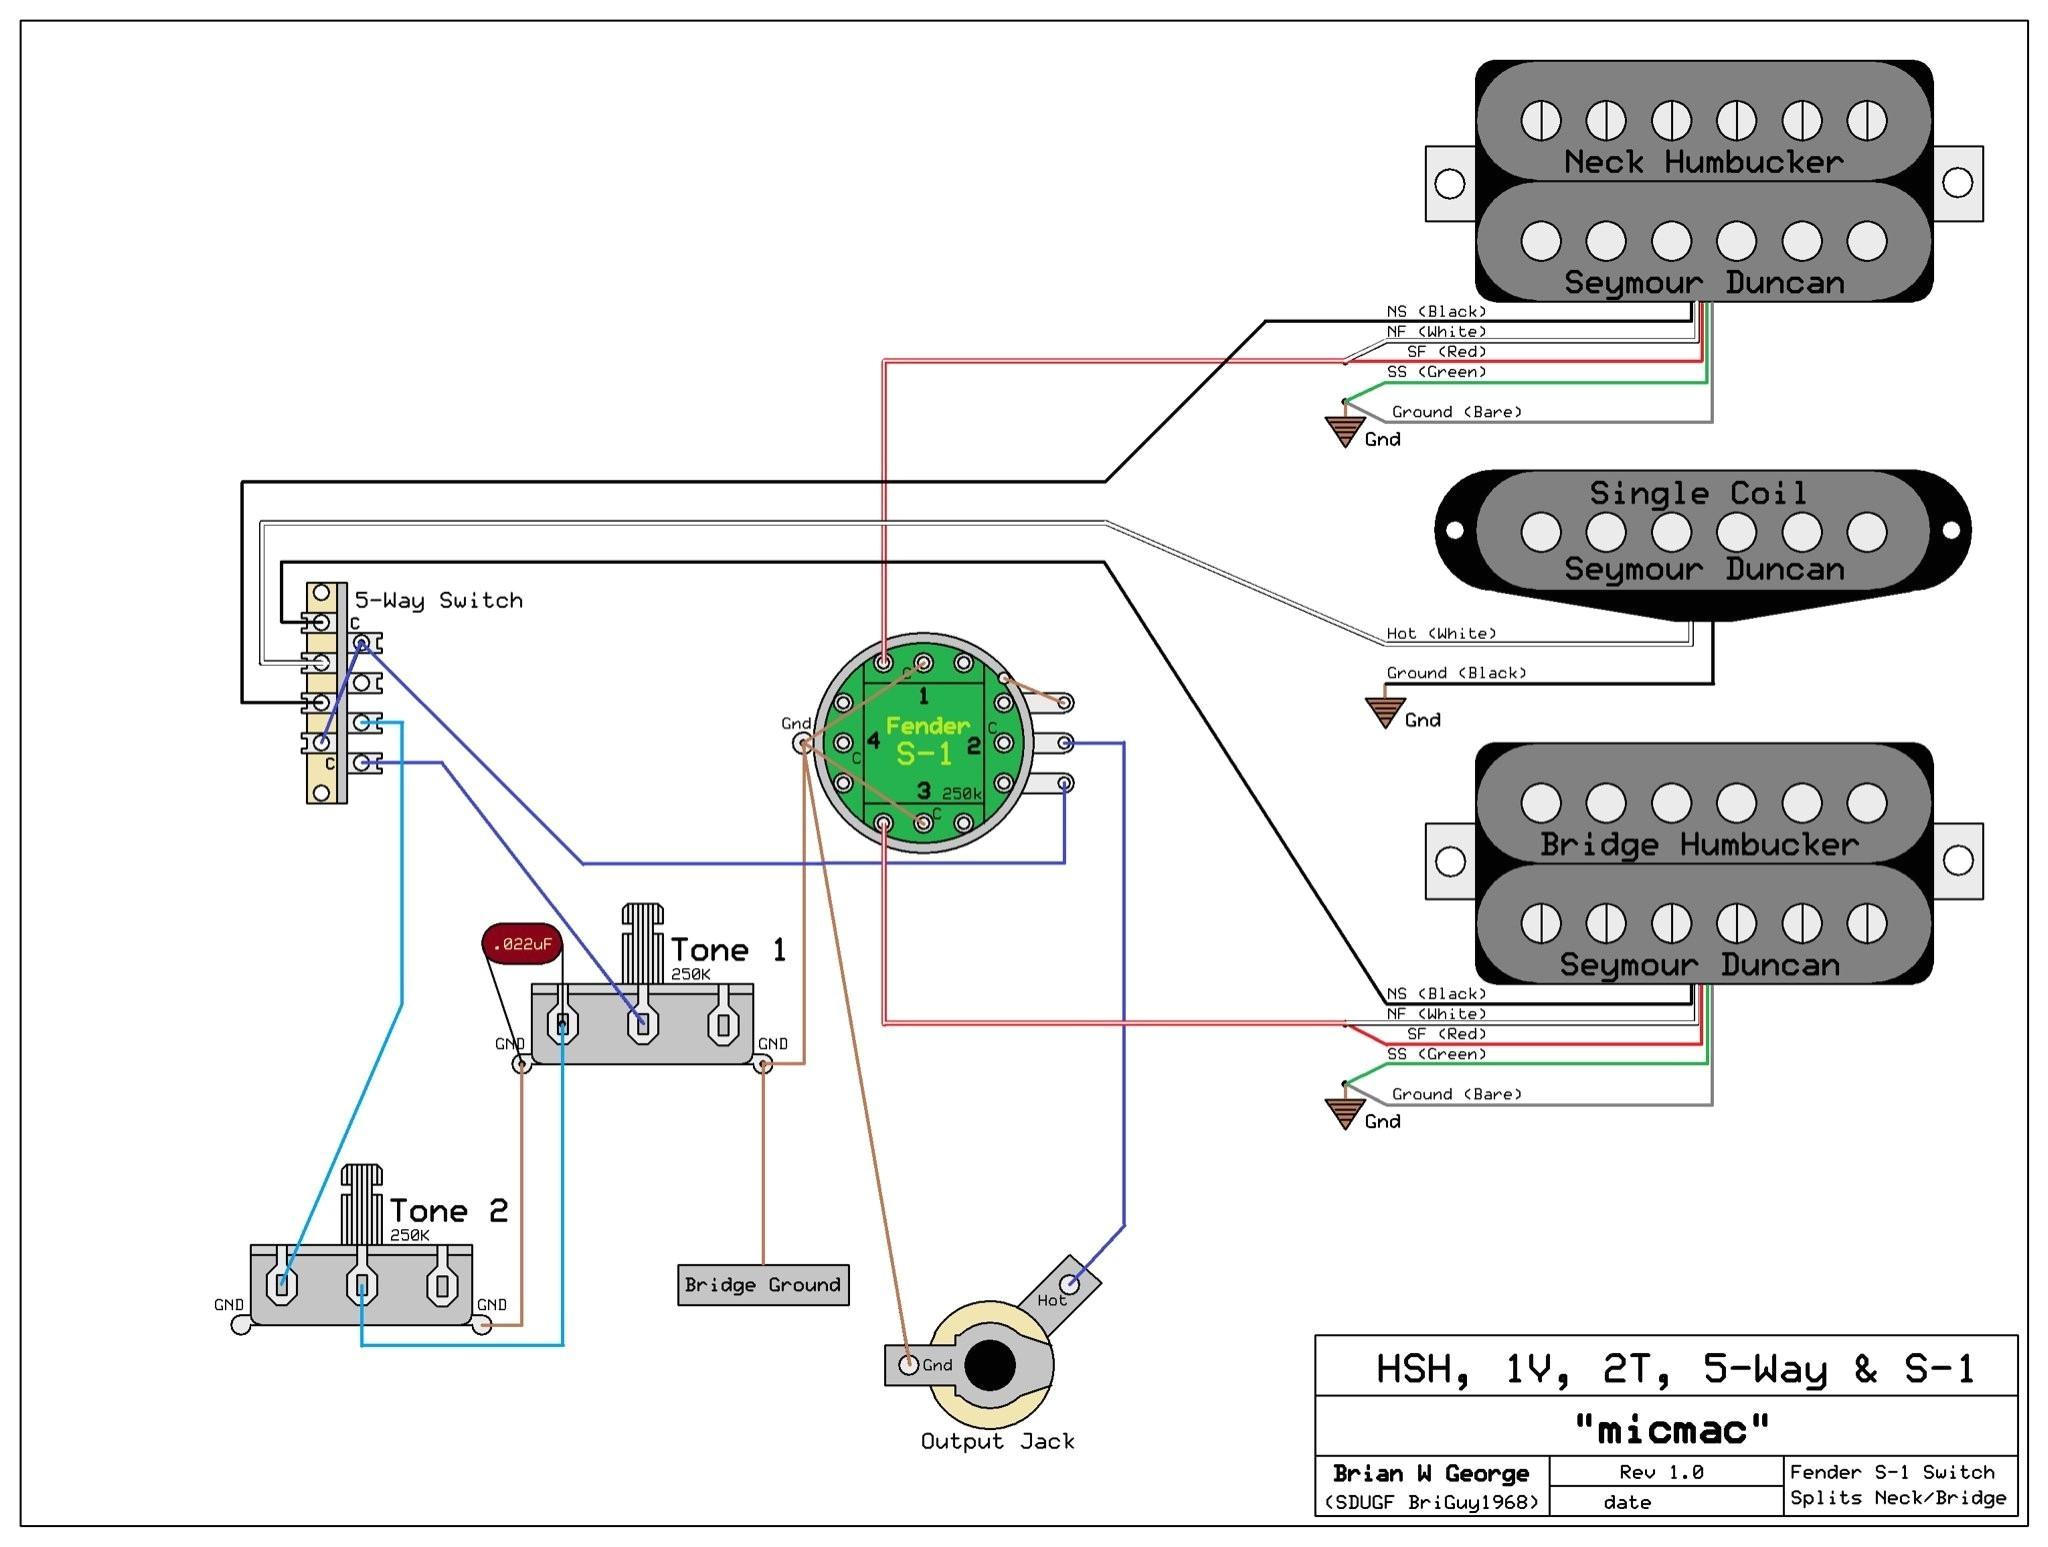 emg wiring diagram inspirational jacksn guitar wiring diagram emg wiring diagram and schematics collection of emg wiring diagram jpg